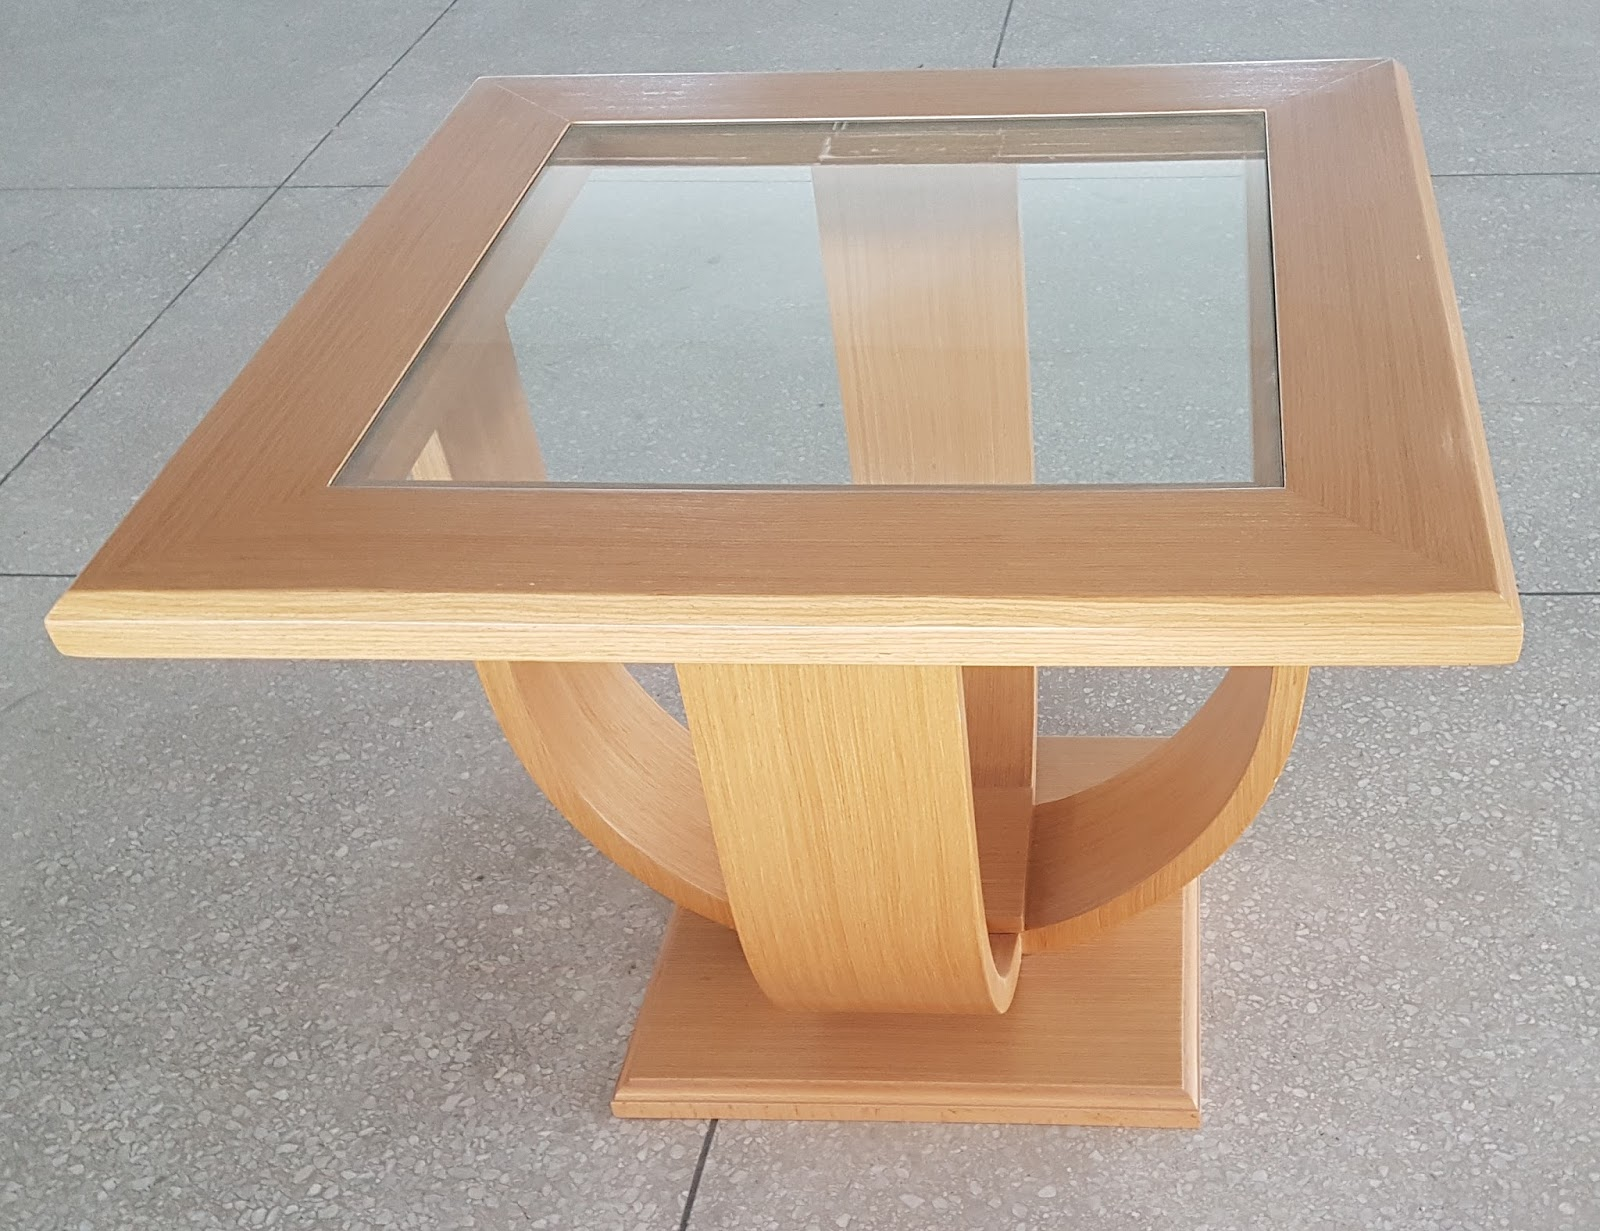 Table En Bois Chene Clair tables basses/tables hautes/ guéridons